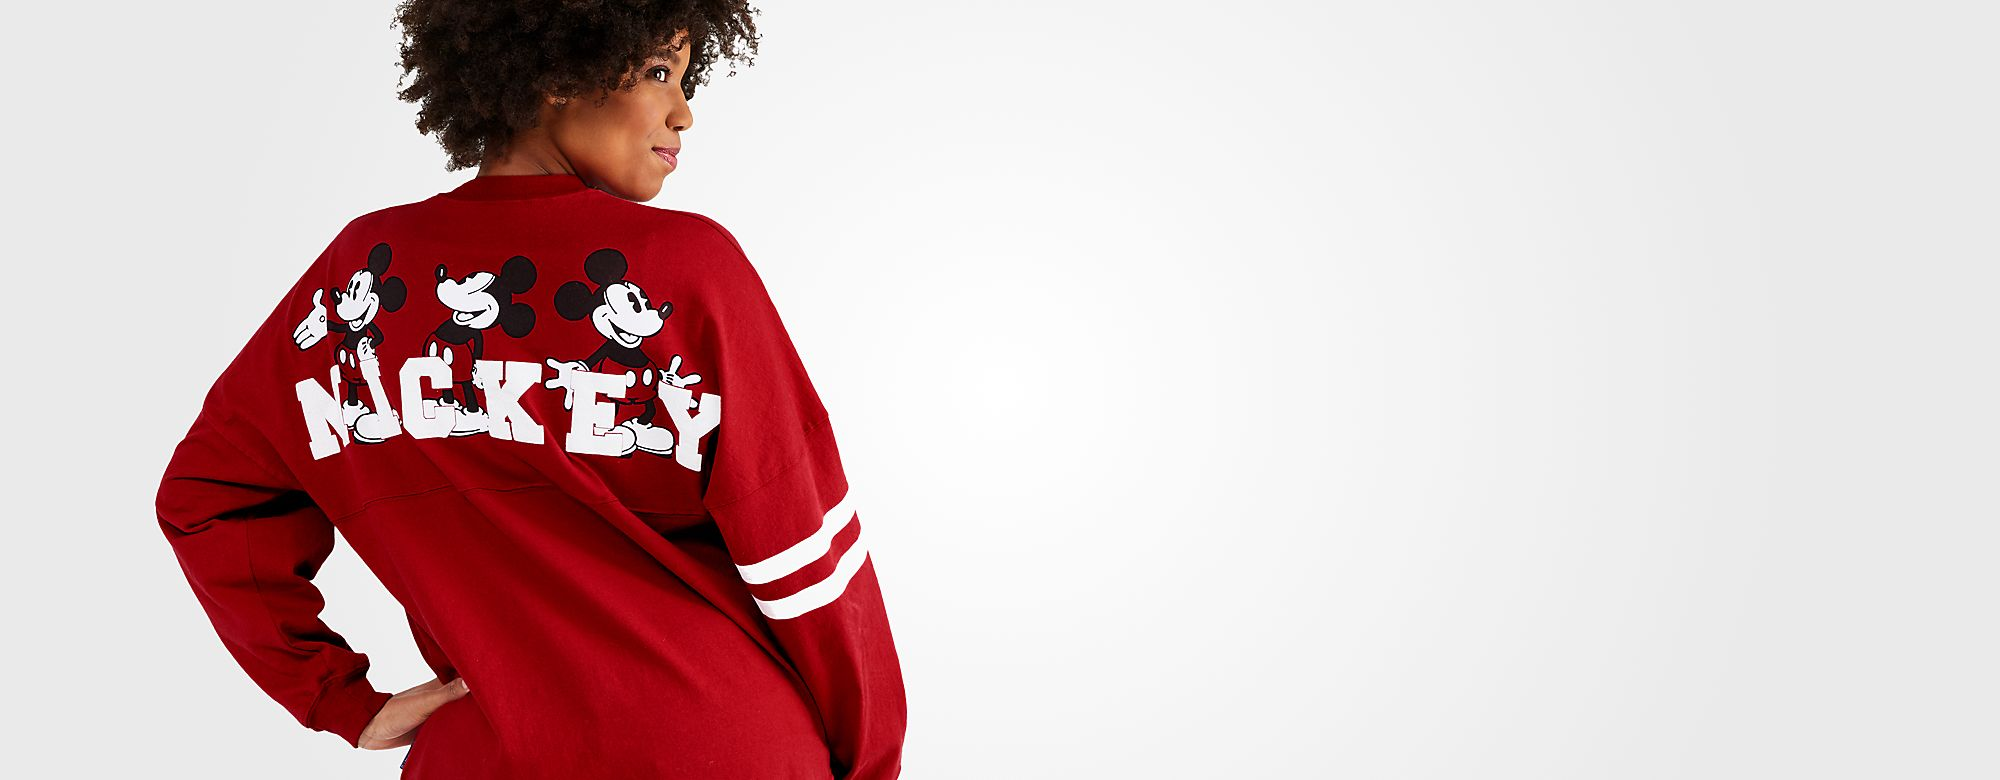 Spirit Jersey Make memories and a fashion statement SHOP NOW